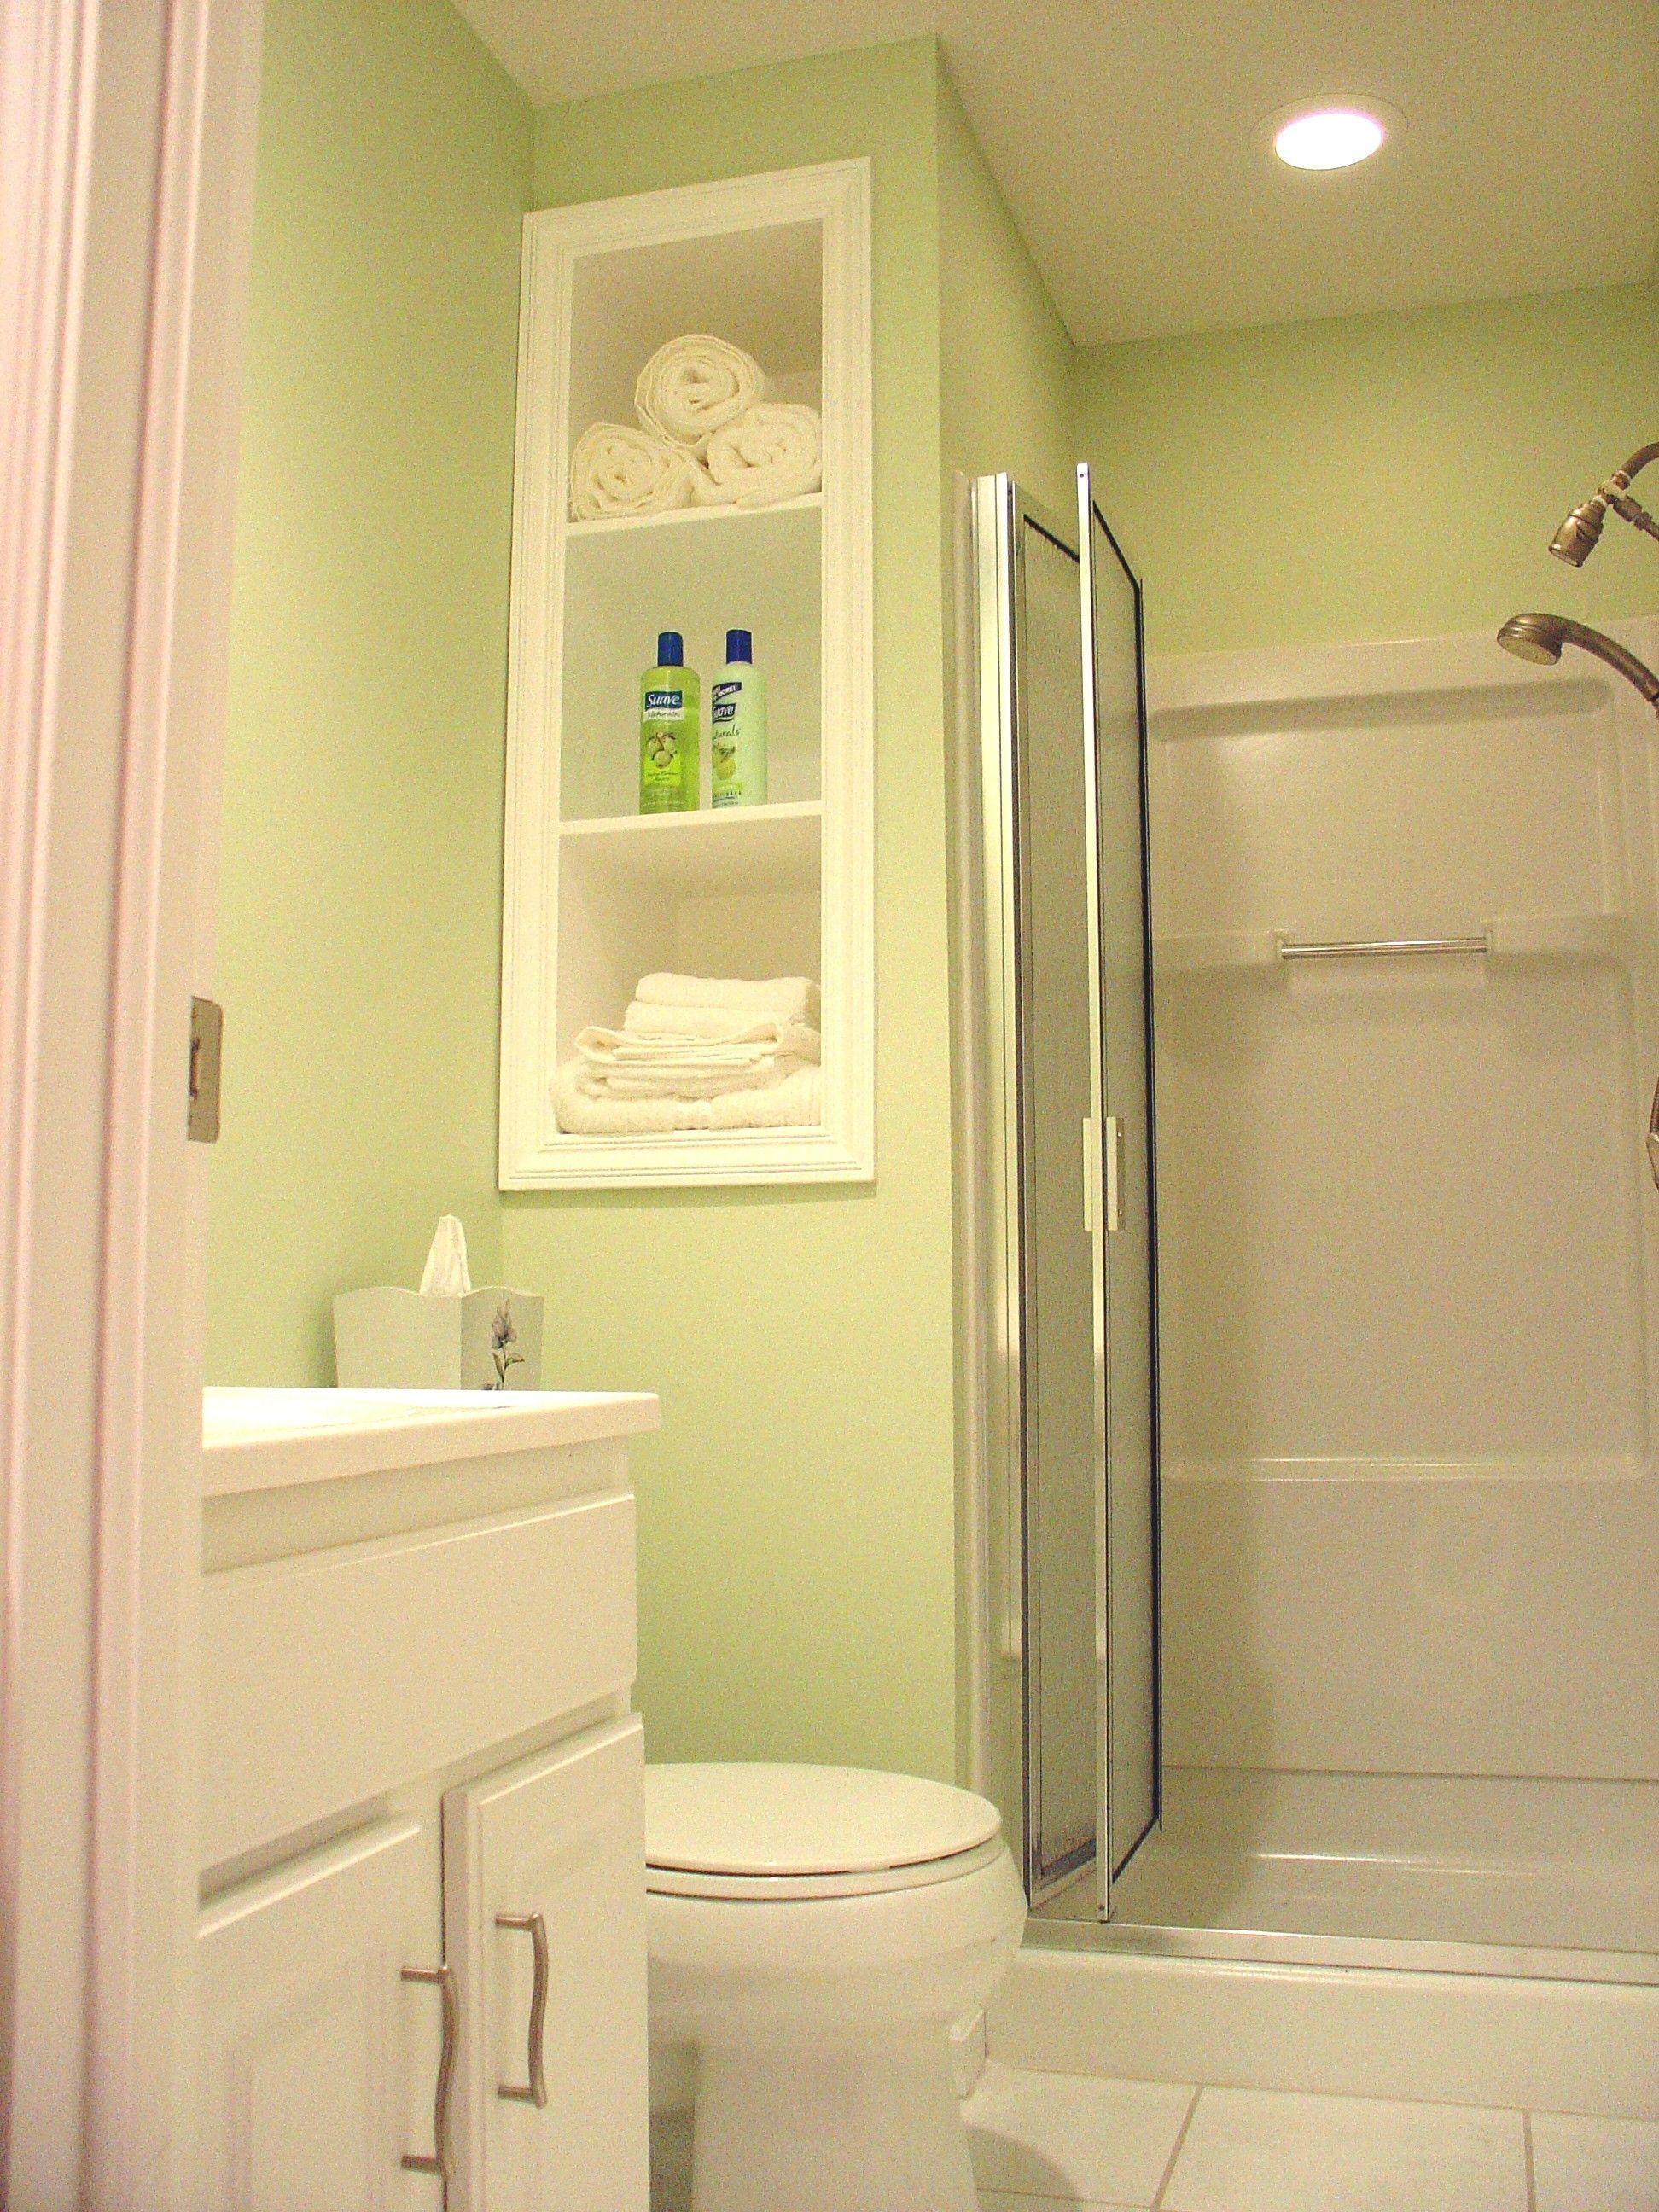 20 Cozy Small Basement Bathroom Designs Trends Small Basement Bathroom Small Bathroom Makeover Basement Bathroom Remodeling